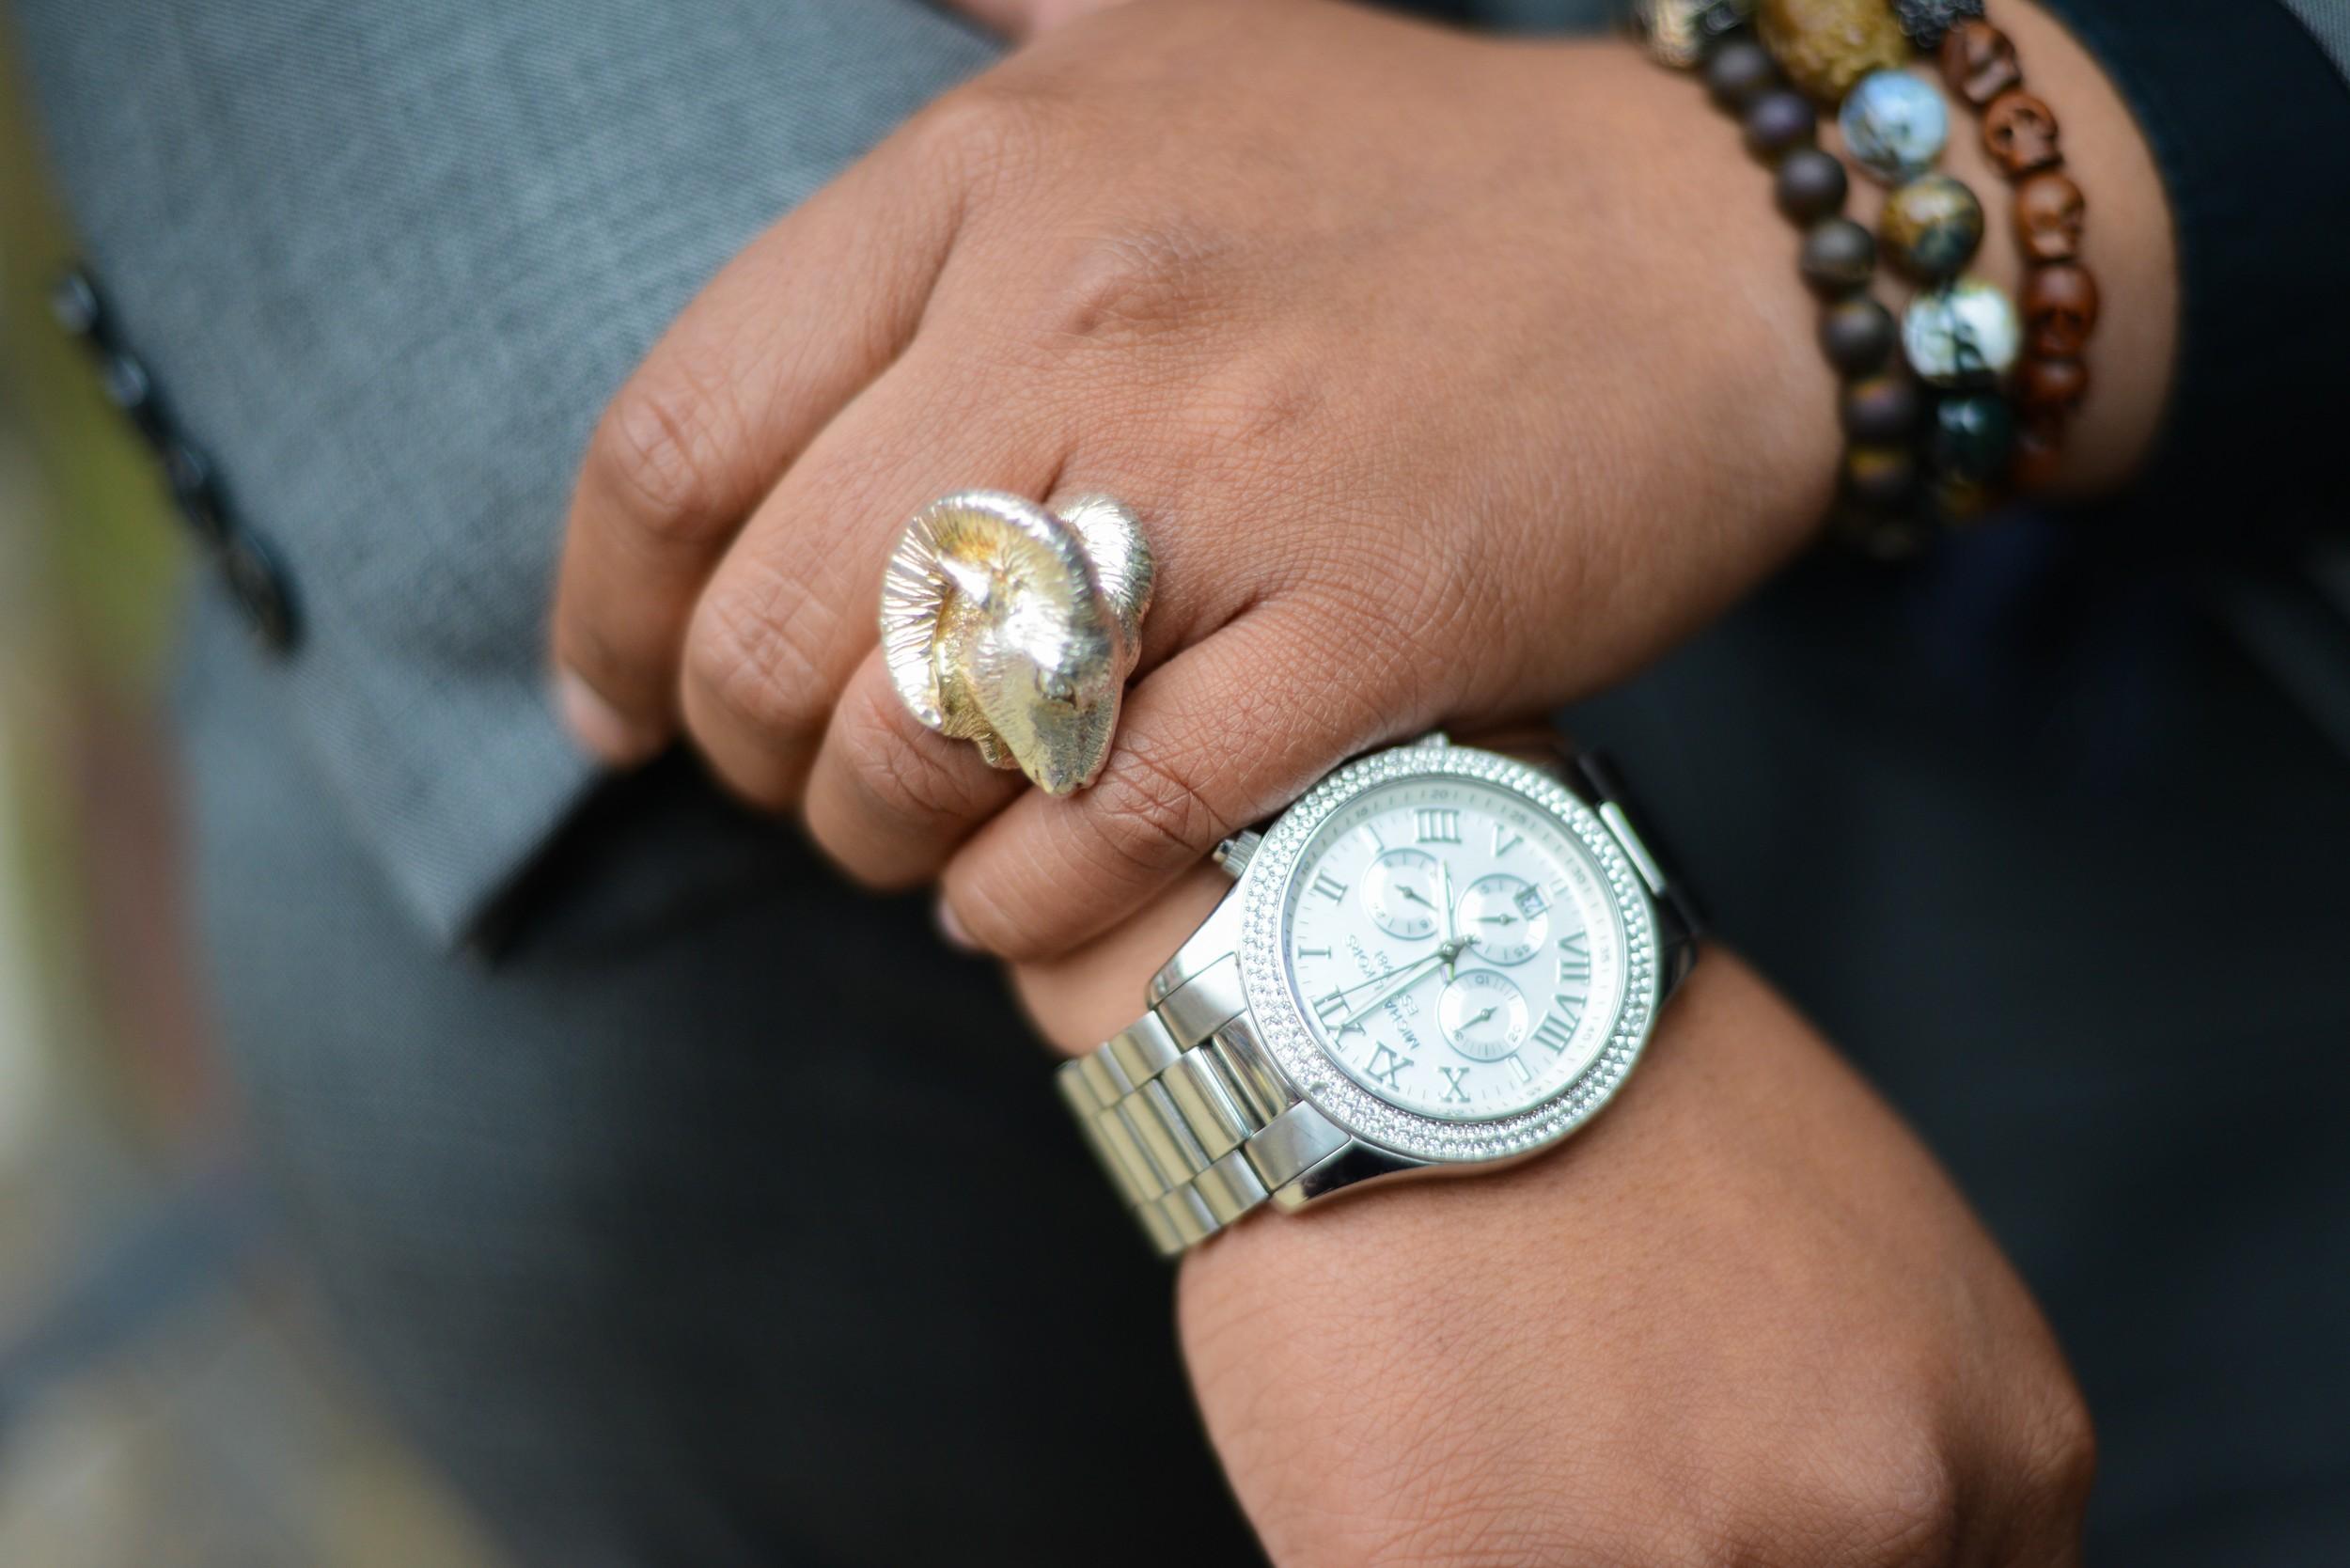 Beelinda Fox, Menswear Stylist